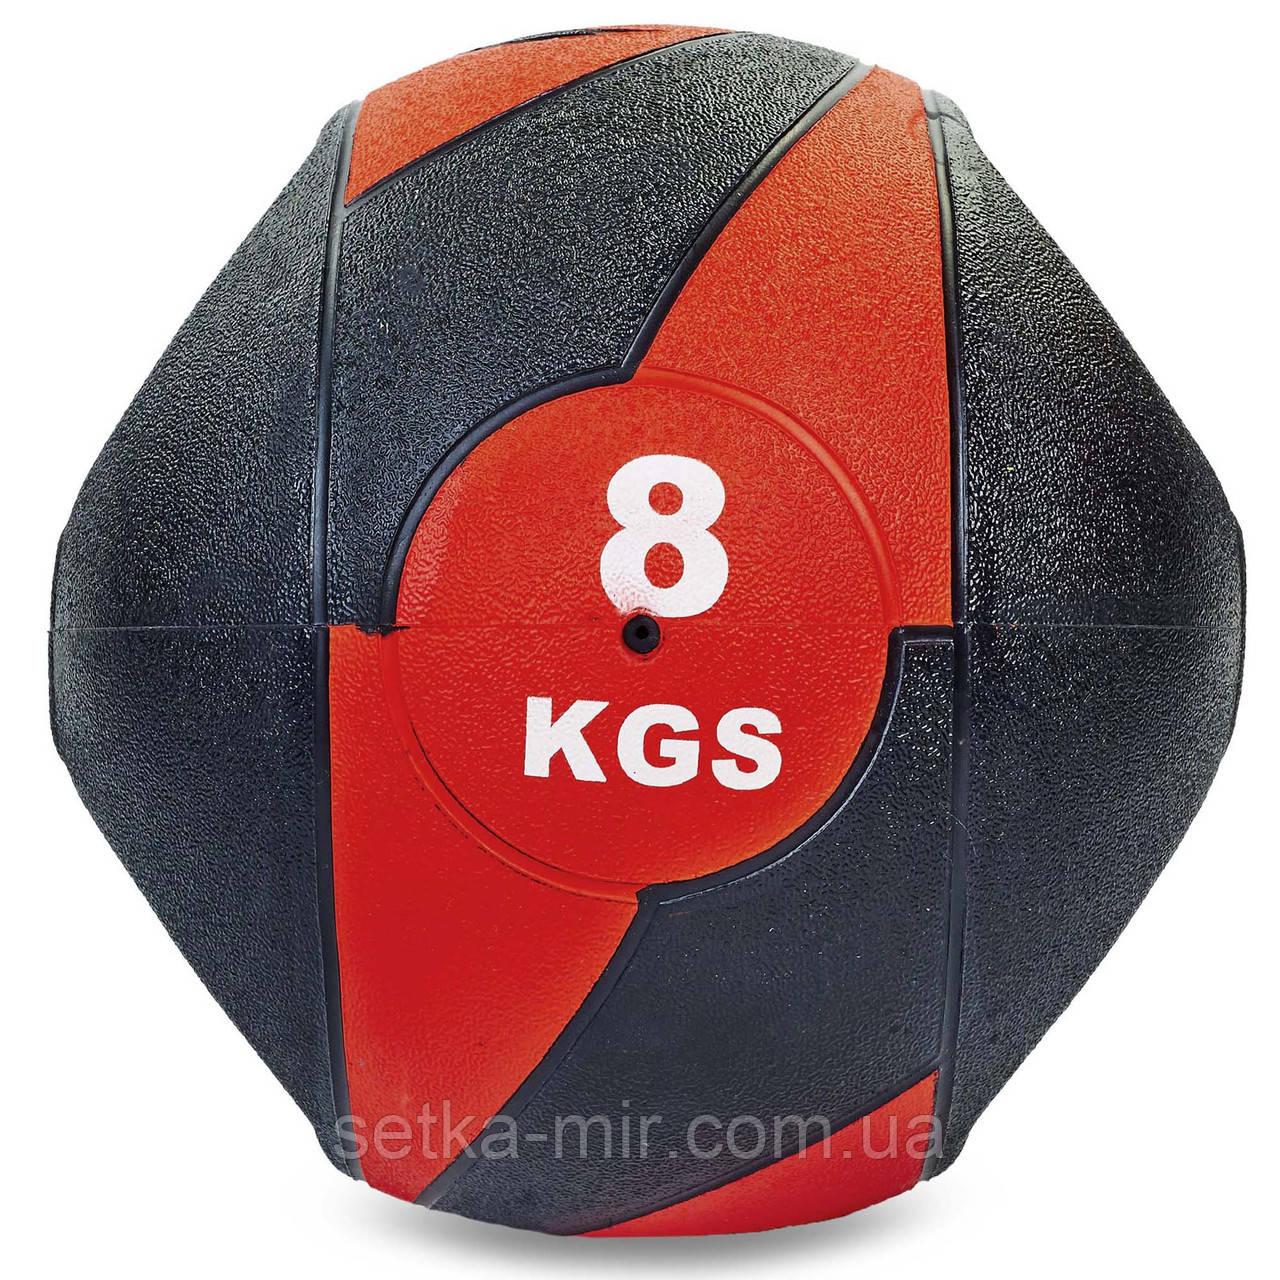 М'яч медичний медбол з двома ручками Record Medicine Ball FI-5111-8 8кг